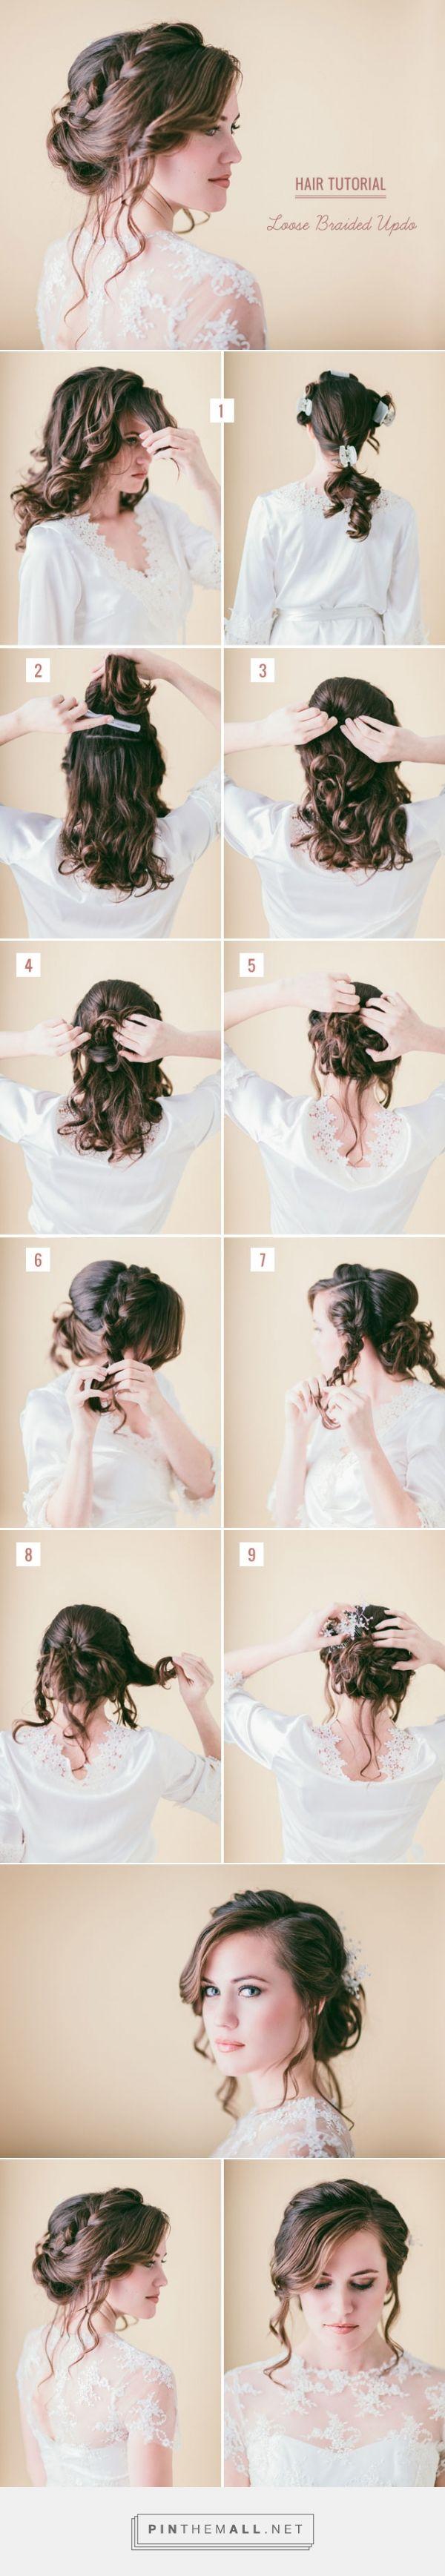 Hair Tutorial: Loose Braided Updo | Green Wedding Shoes Wedding Blog | Wedding T...